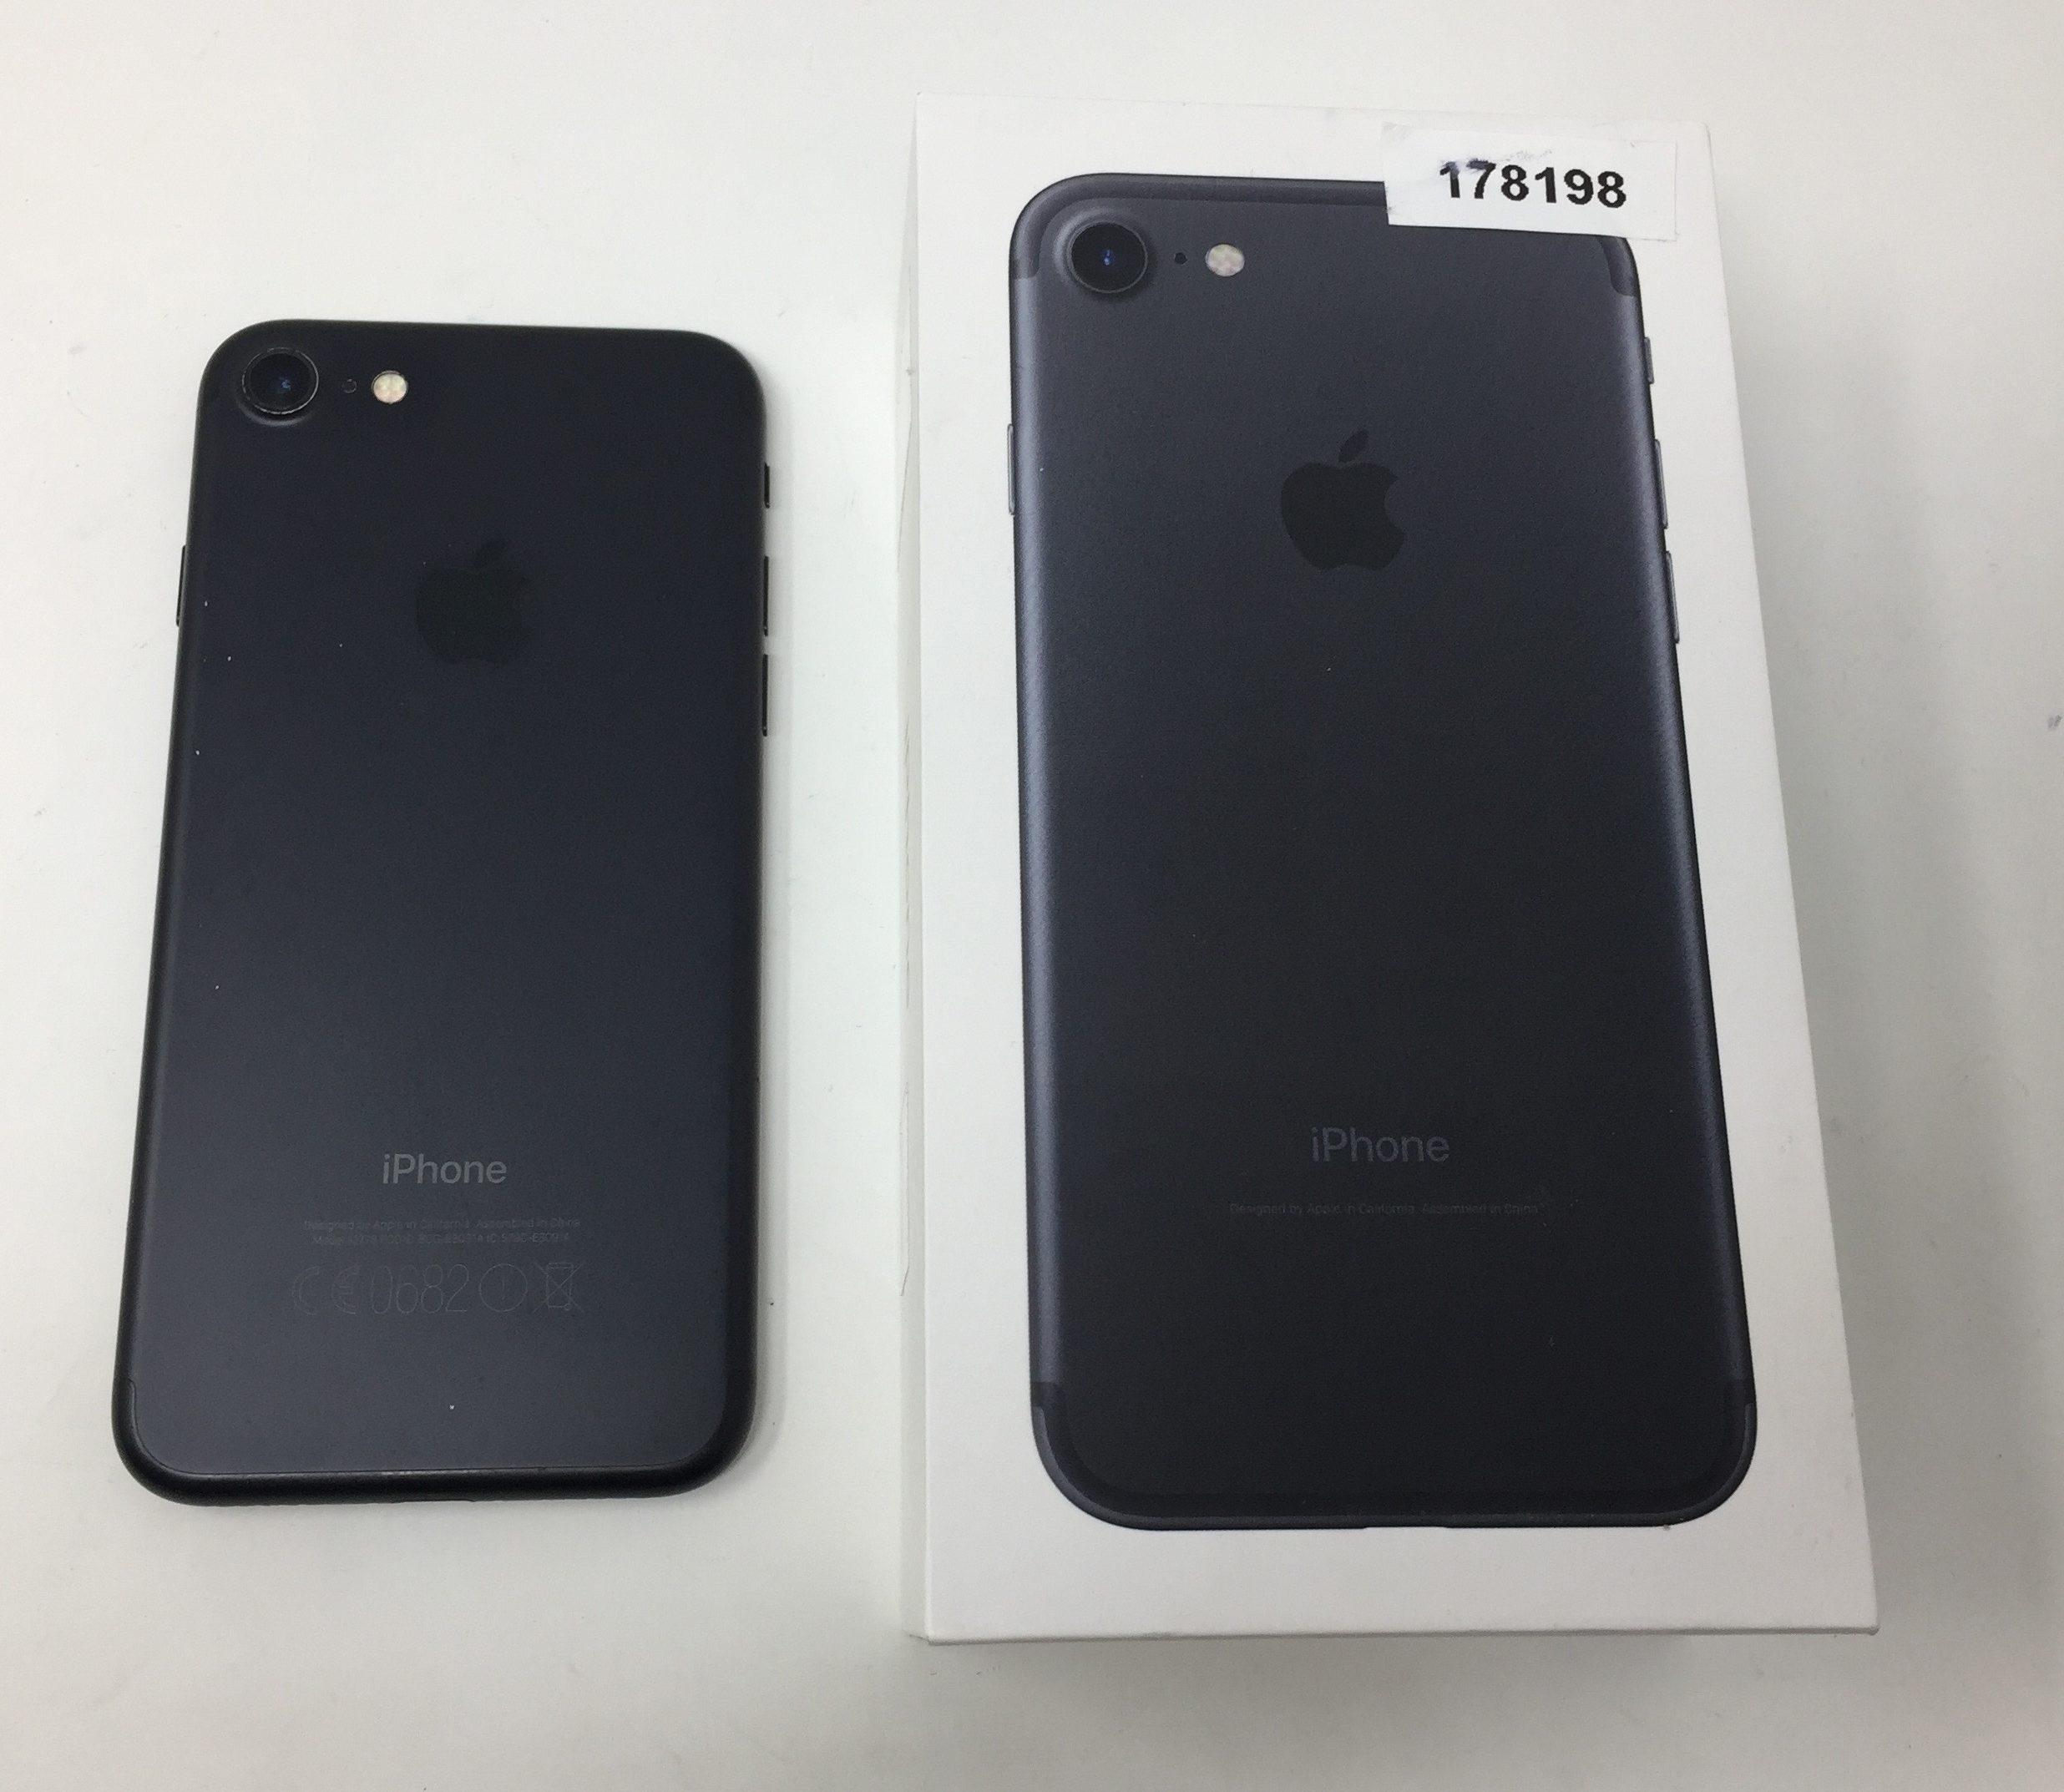 iPhone 7 128GB, 128 GB, Black, bild 2